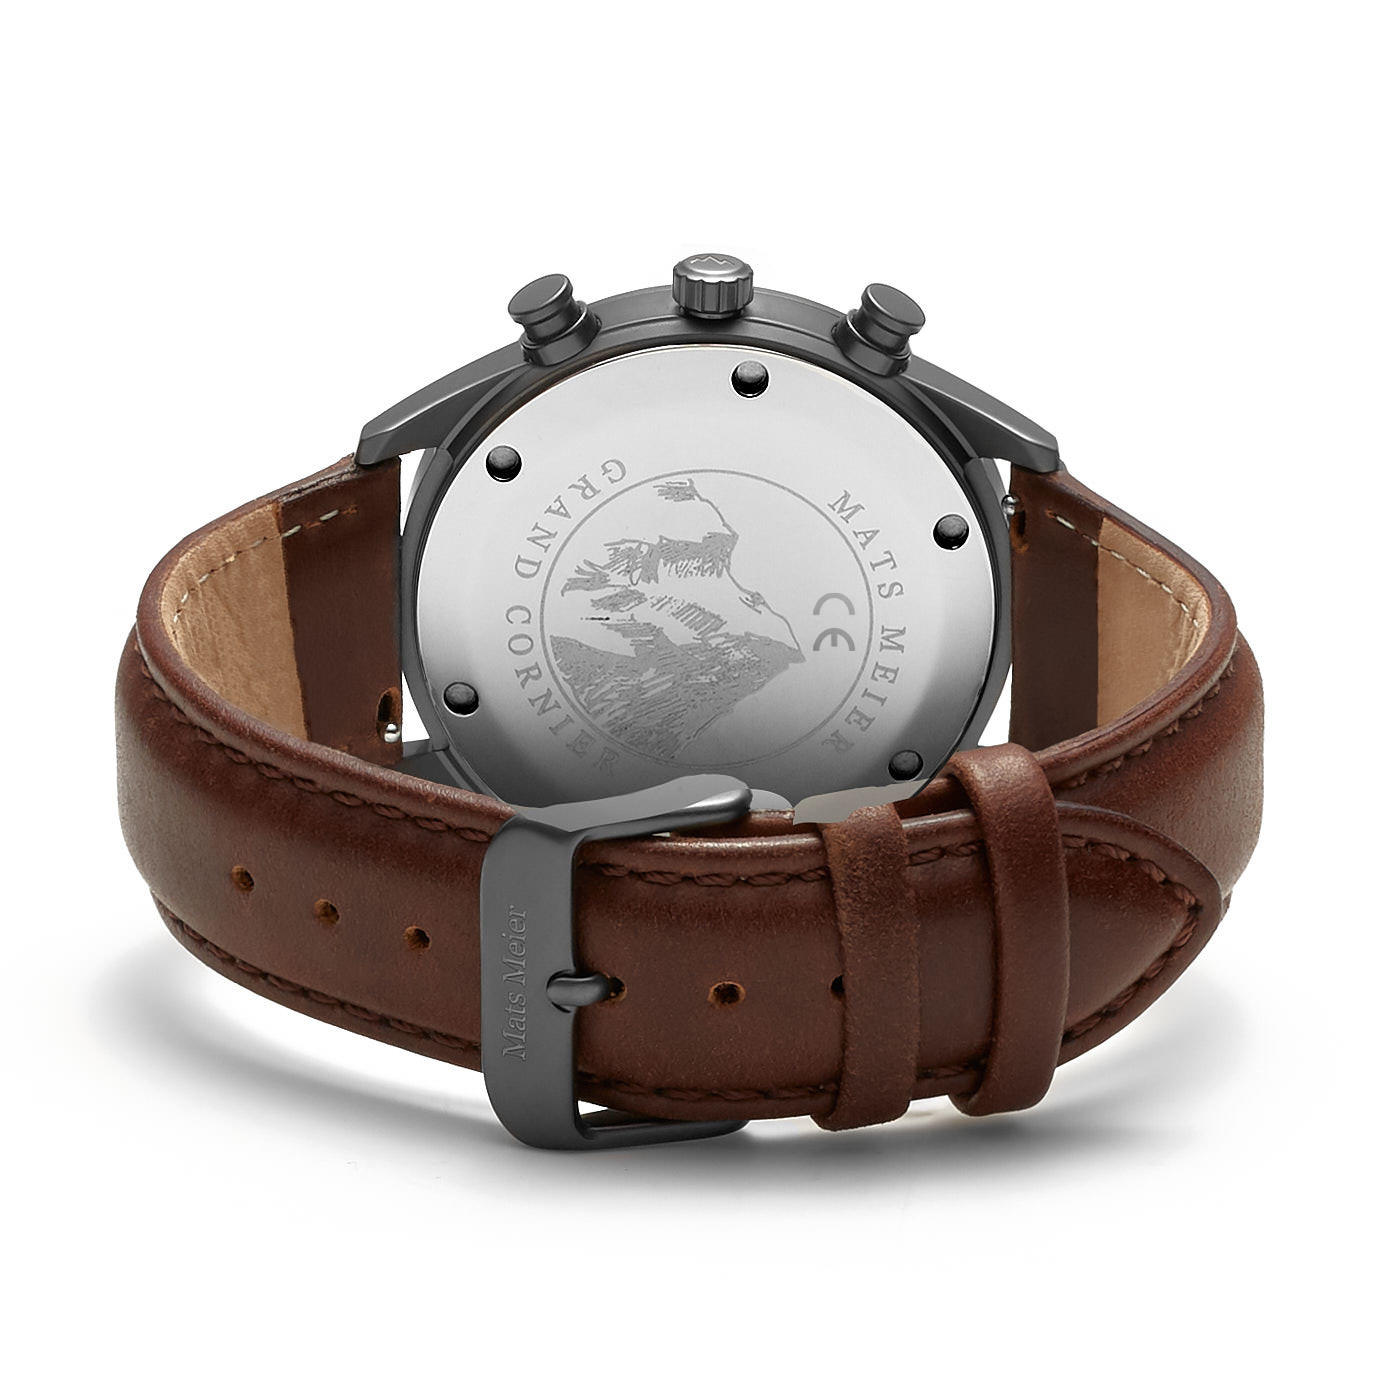 Mats Meier Grand Cornier chronograaf herenhorloge bruin en gunmetal